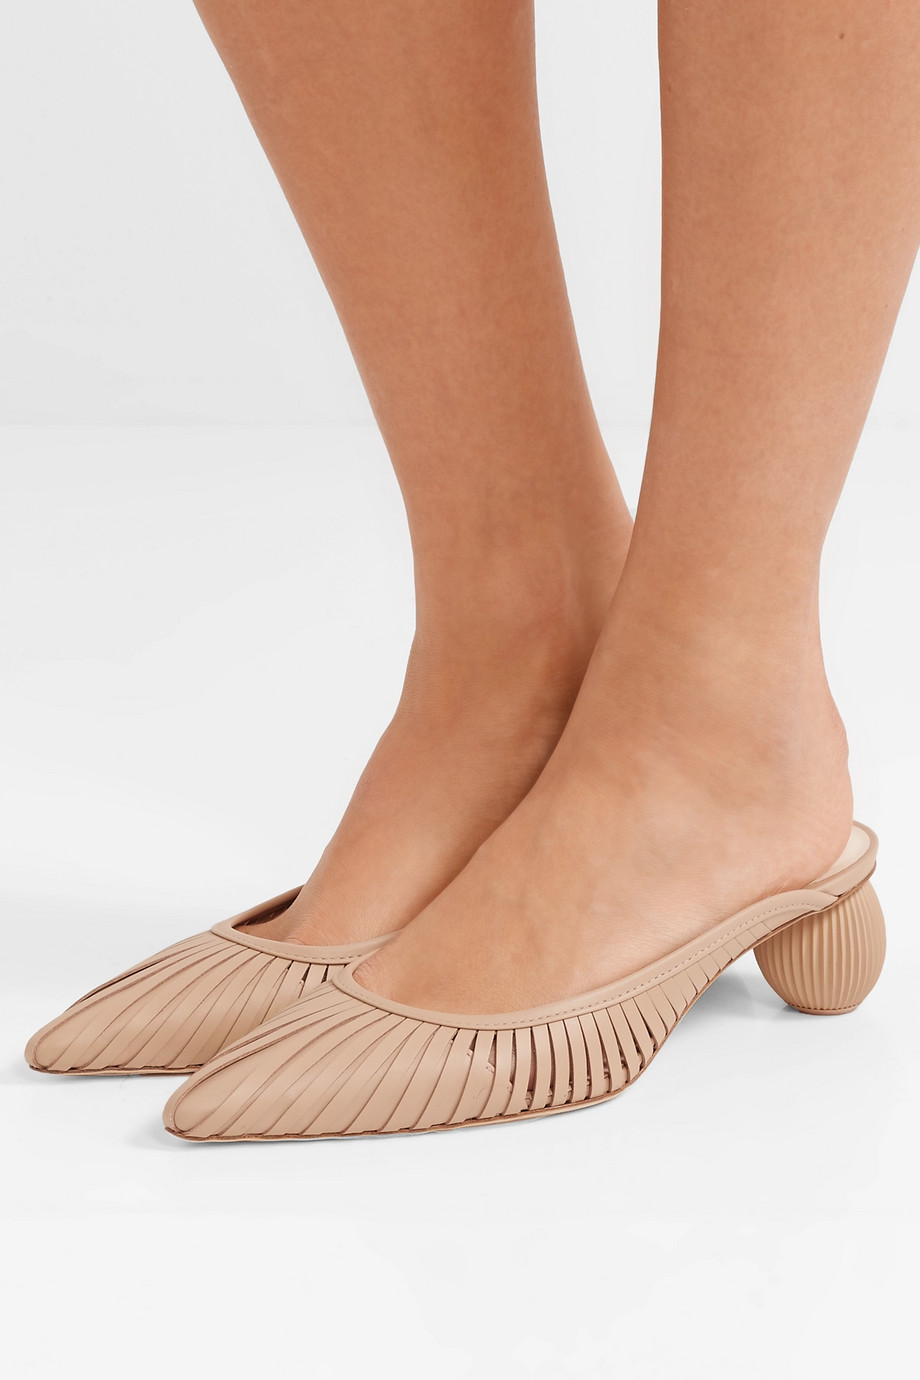 Cult Gaia sandals